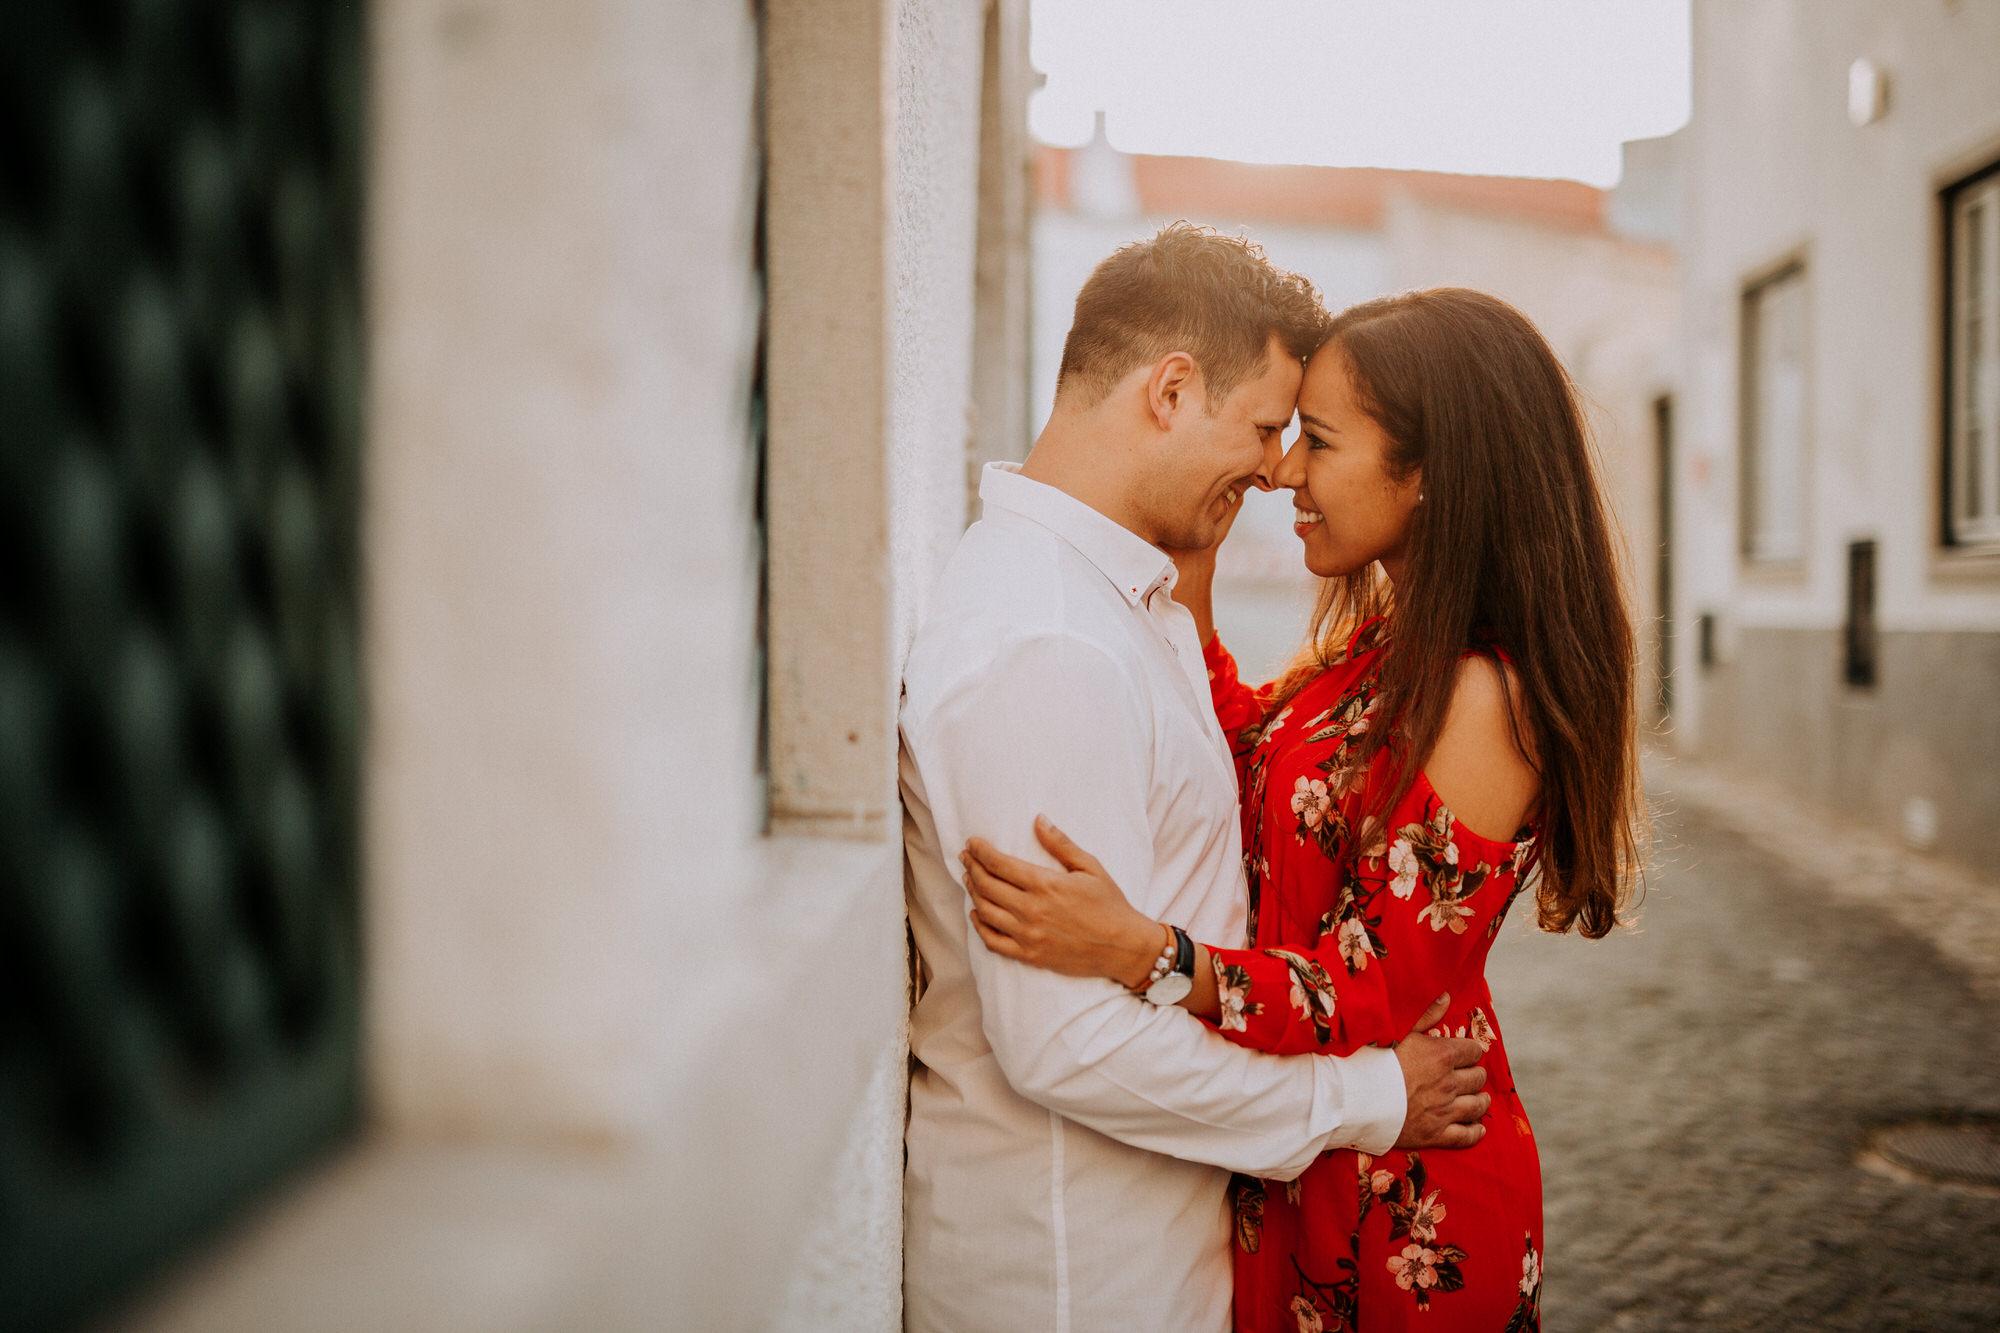 20-sessao-noivado-engagement-love-session-Sintra-lisboa-town-wedding-photography-photographer-natural-best-venue-planner-destination-filipe-santiago-fotografia-lifestyle-documentary